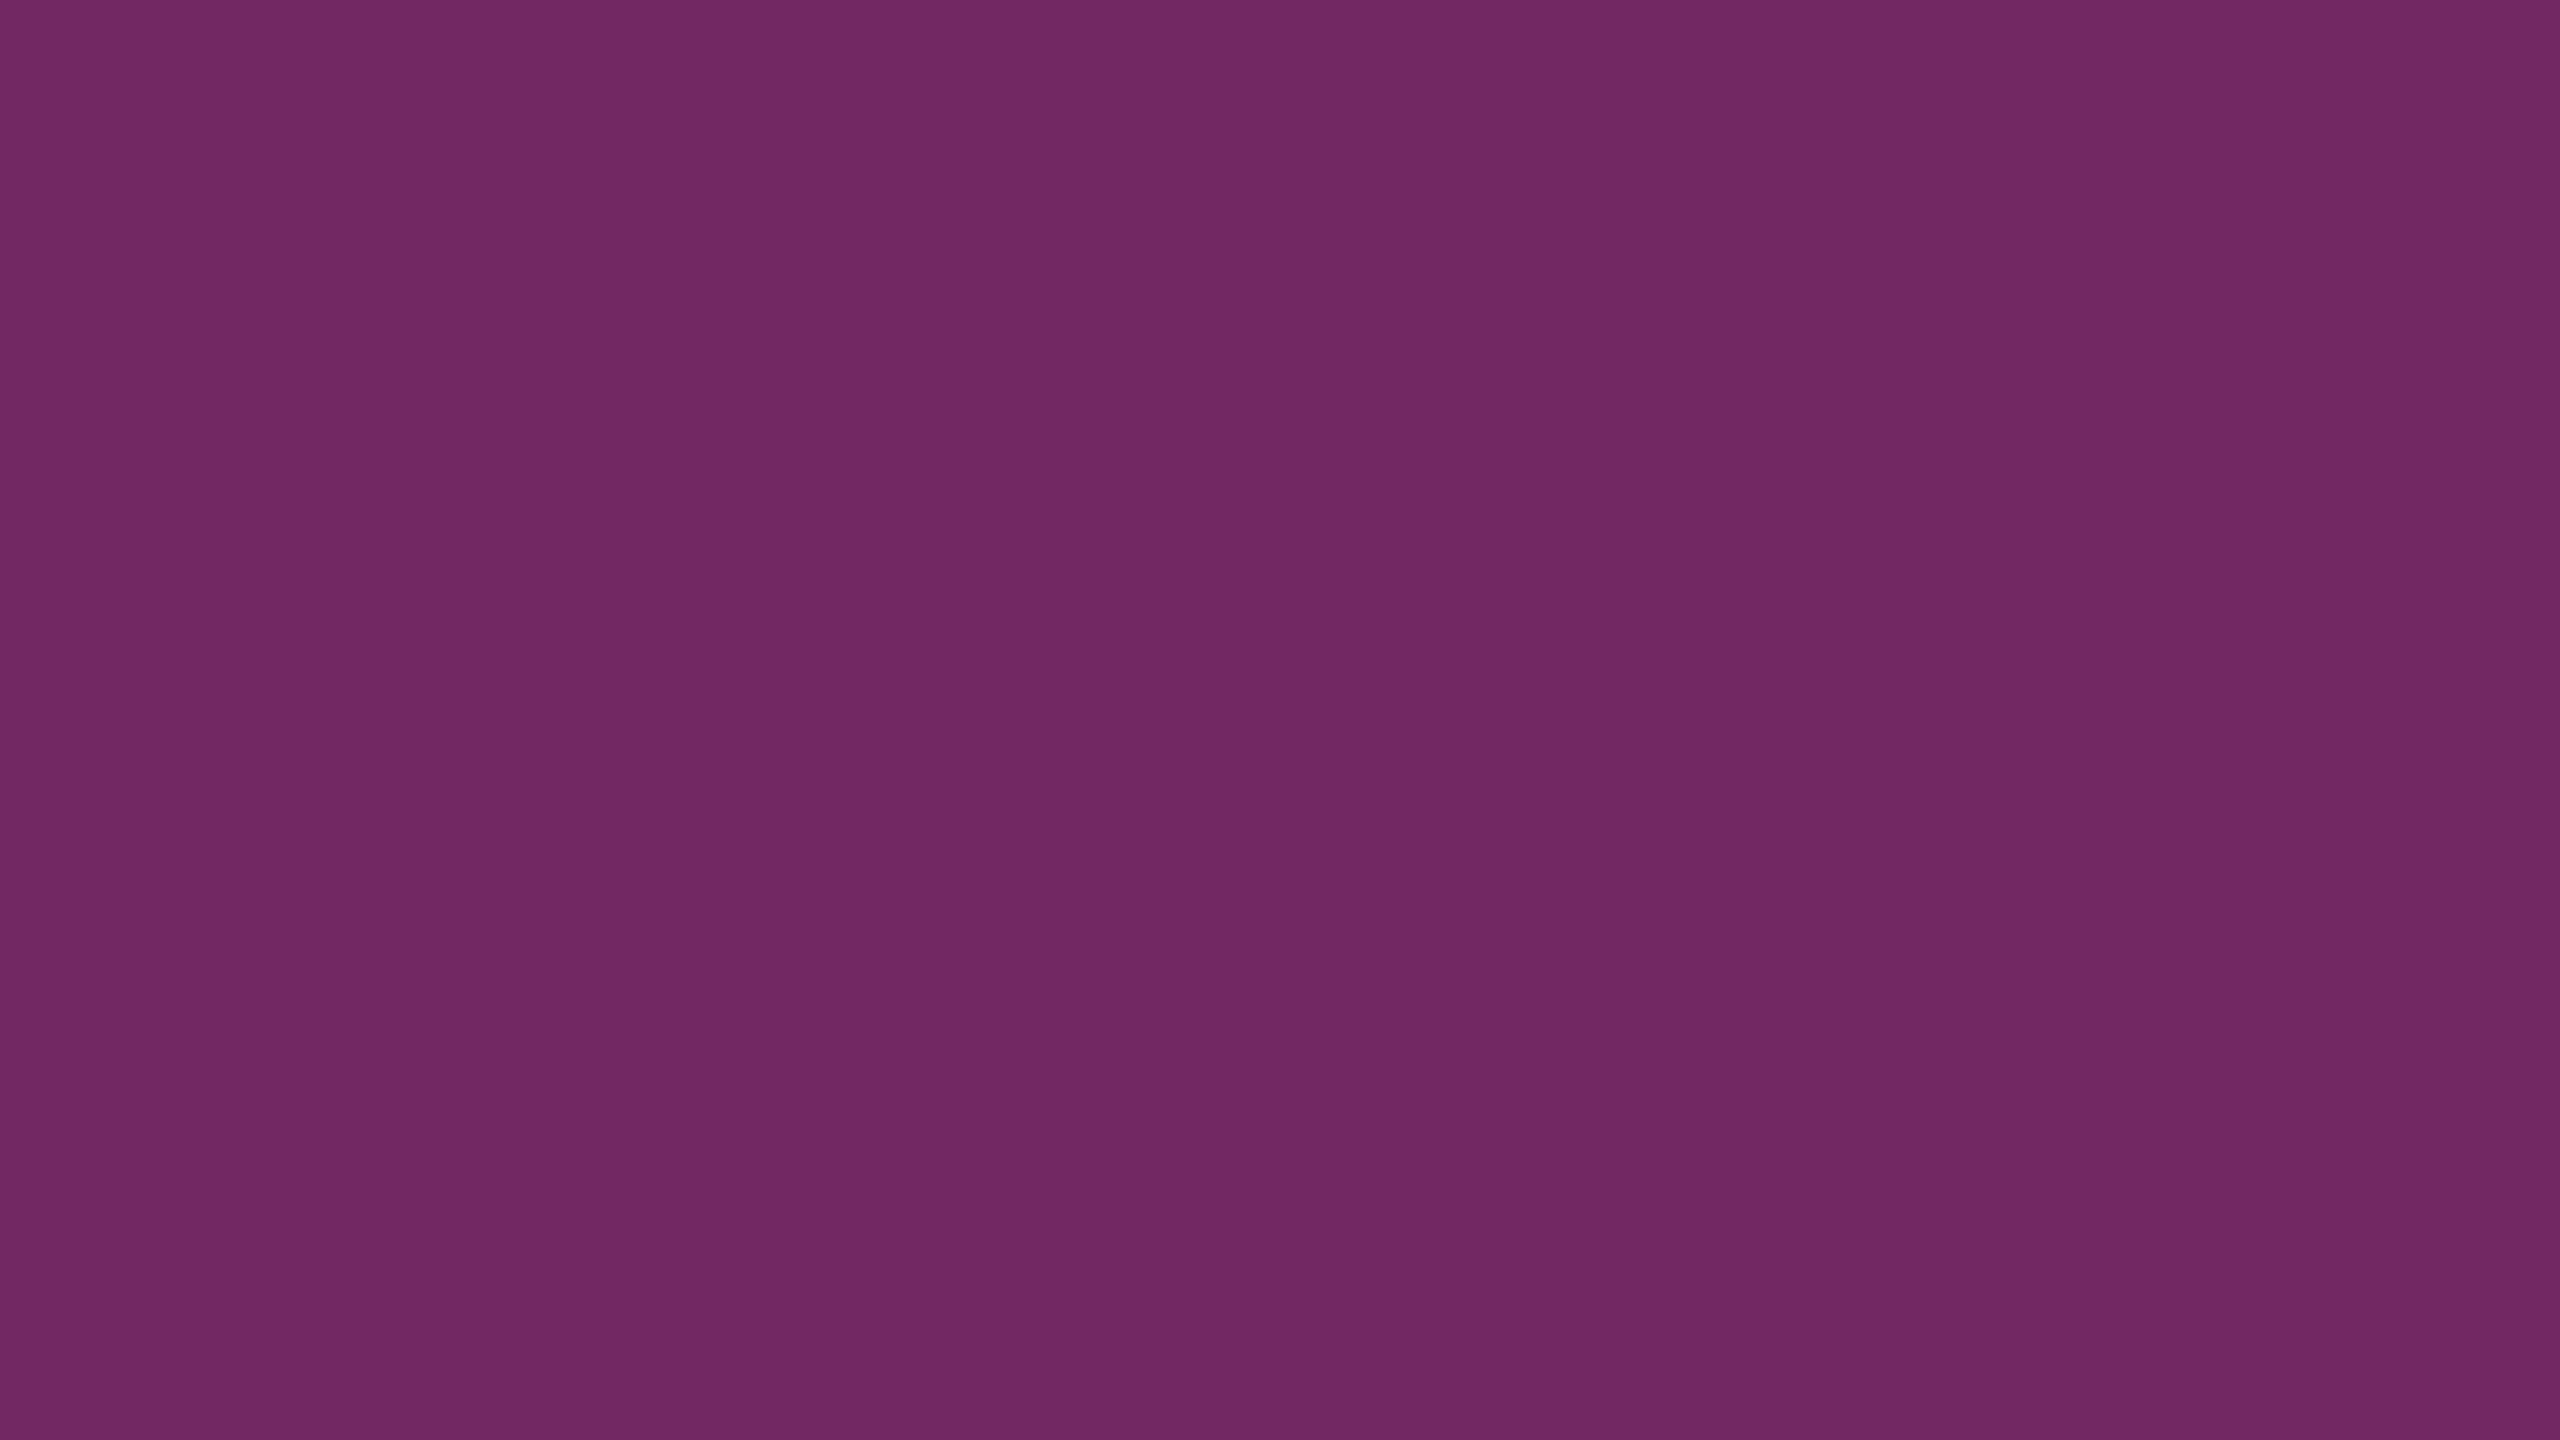 Byzantium+Color Free 2560x1440 resolution Byzantium